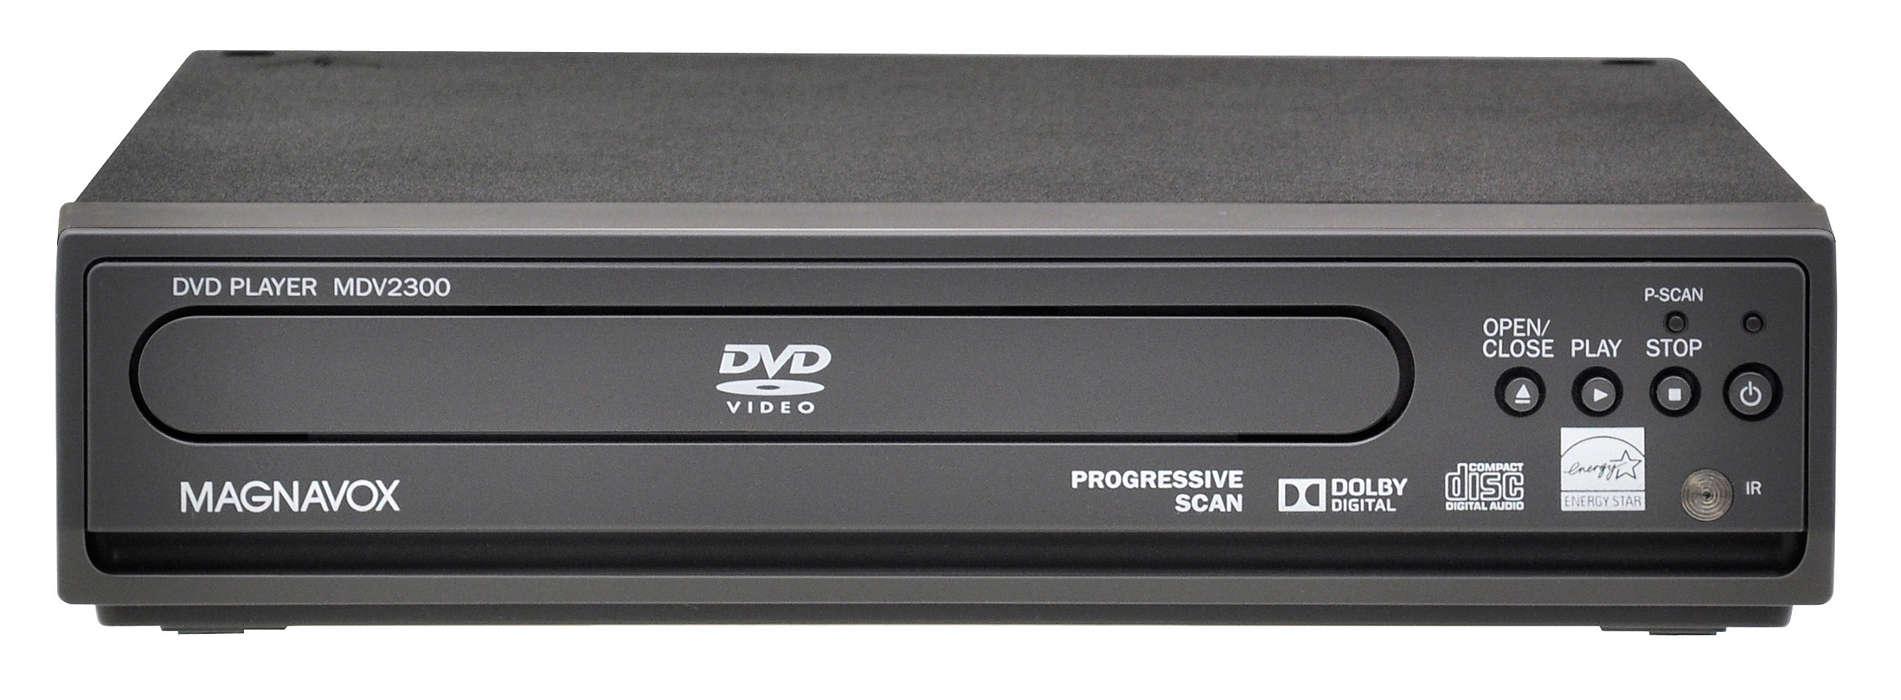 Lecteur de DVD avec balayage progressif